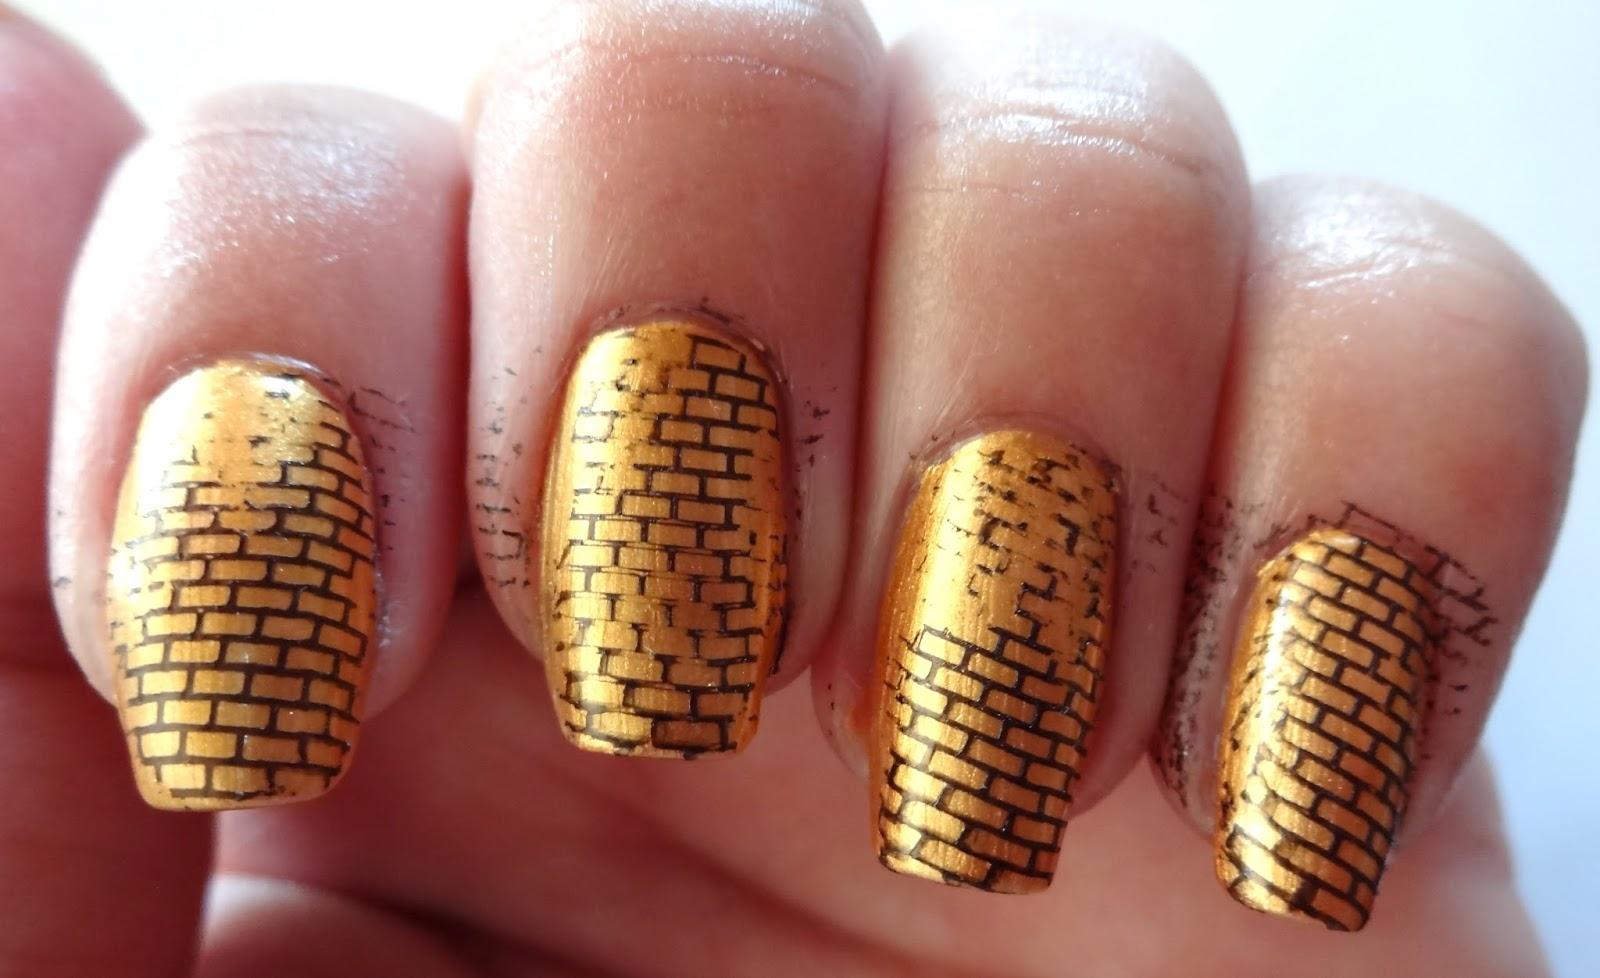 Brick stamped nails